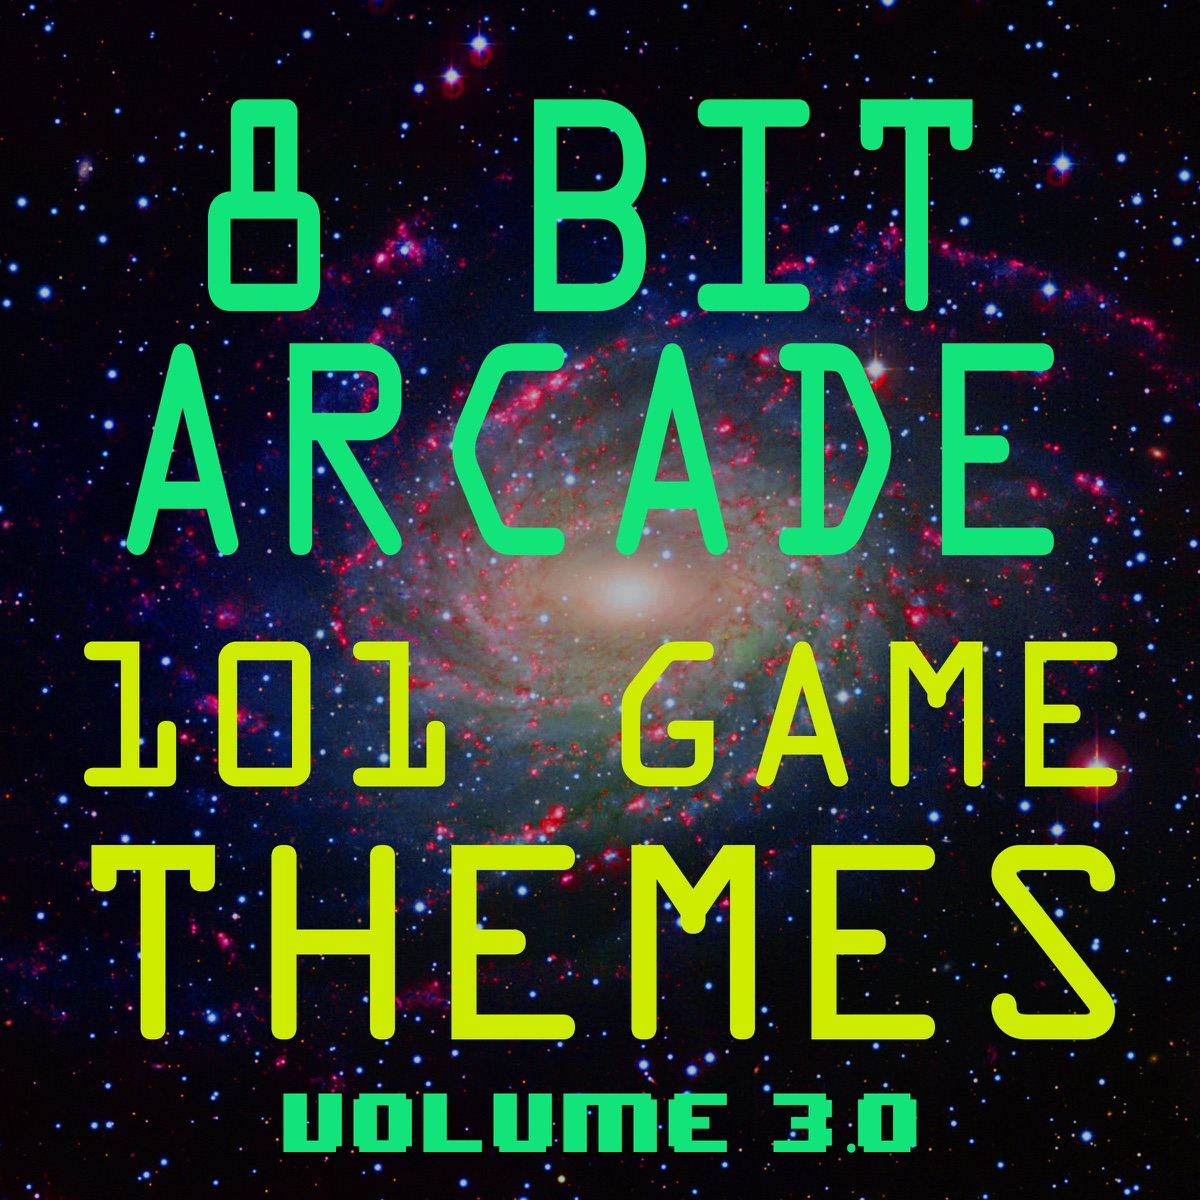 101 Game Themes Vol 30 8-Bit Arcade CD cover